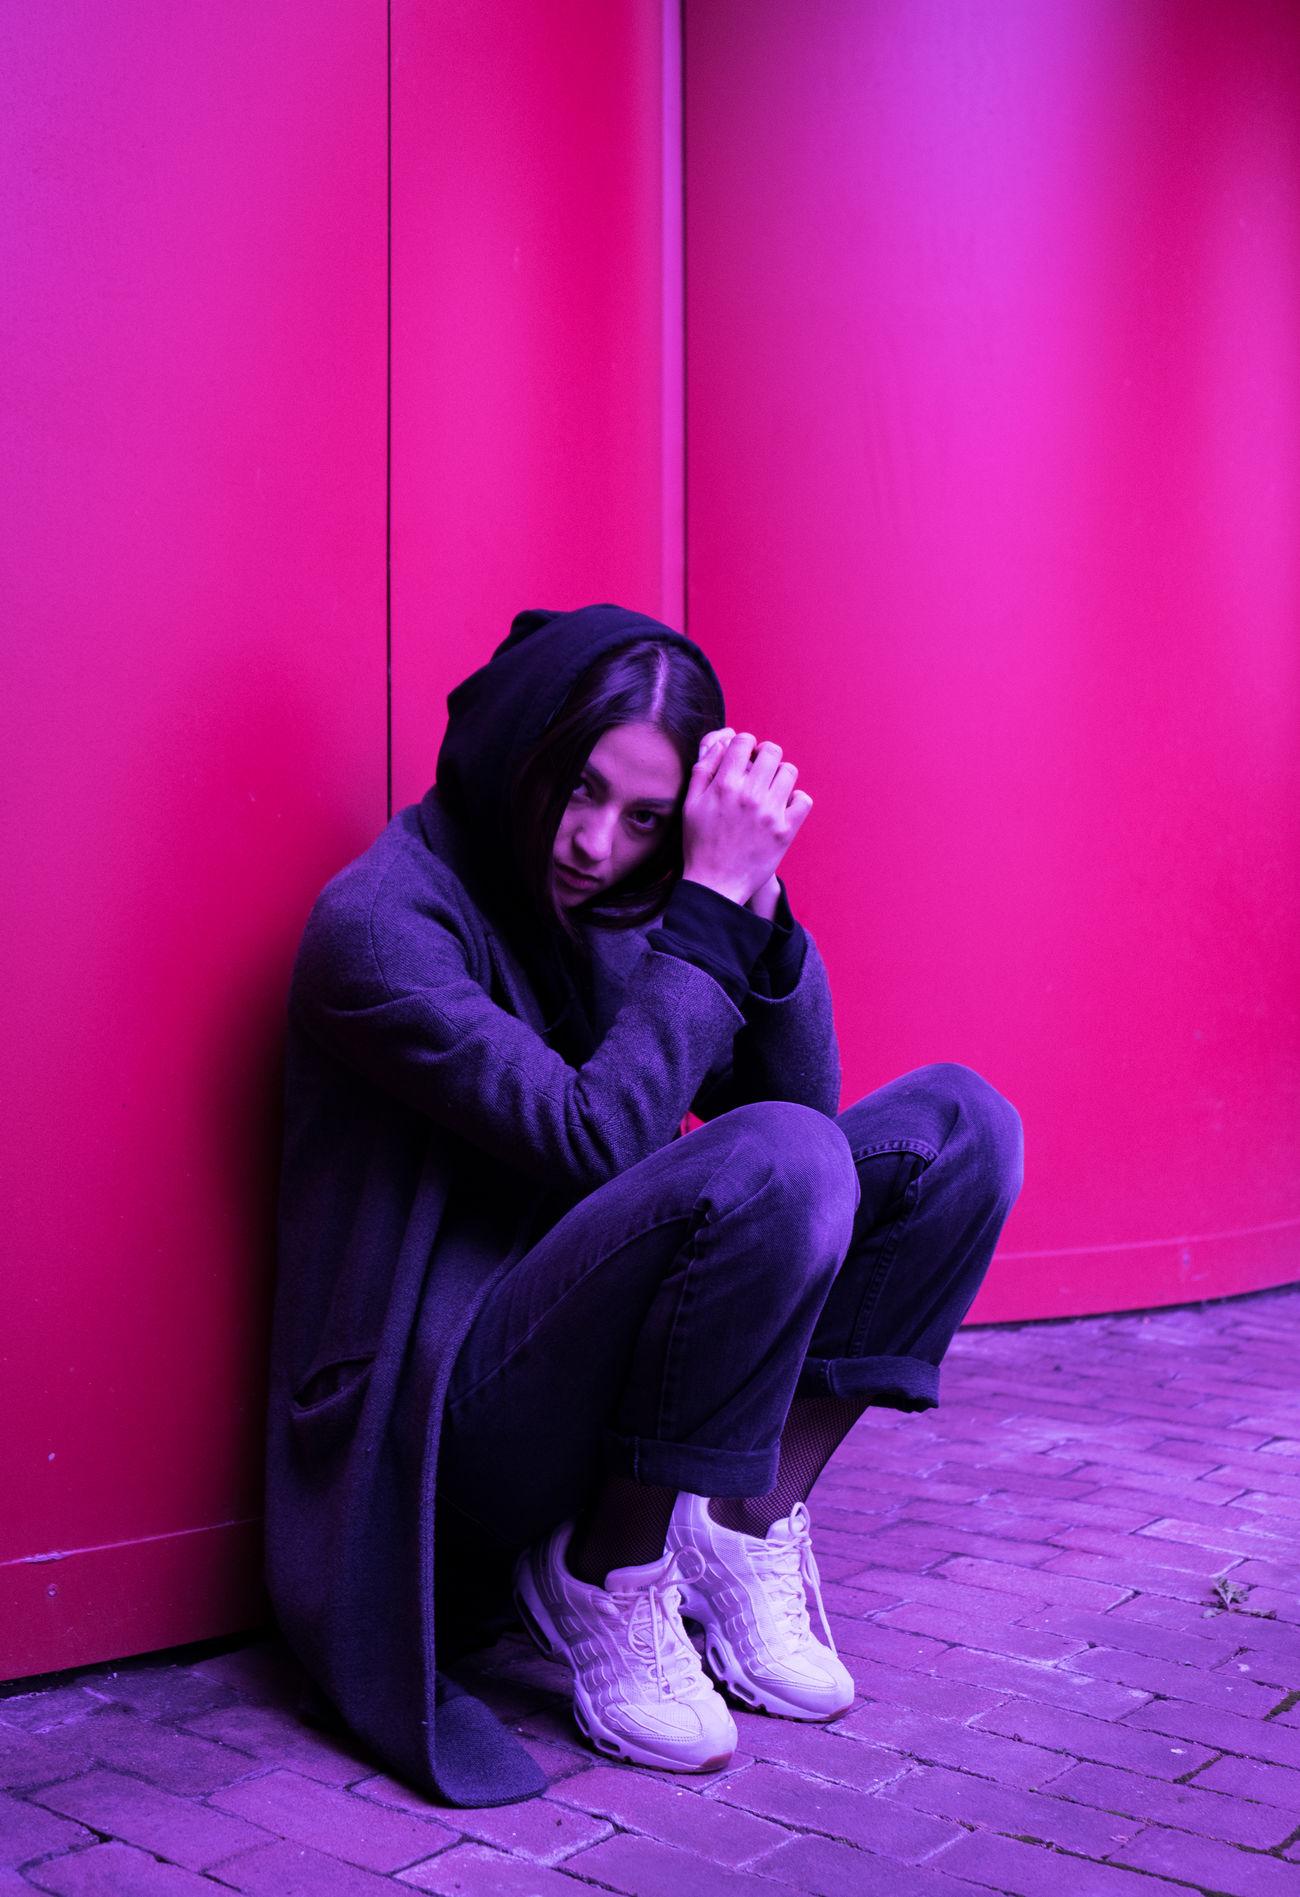 MARISSA LEE 0711 Adults Only Constantinschiller Depression - Sadness Full Length Herrschiller Loneliness One Person Schillergirls Sitting Social Issues Stuttgart Young Adult